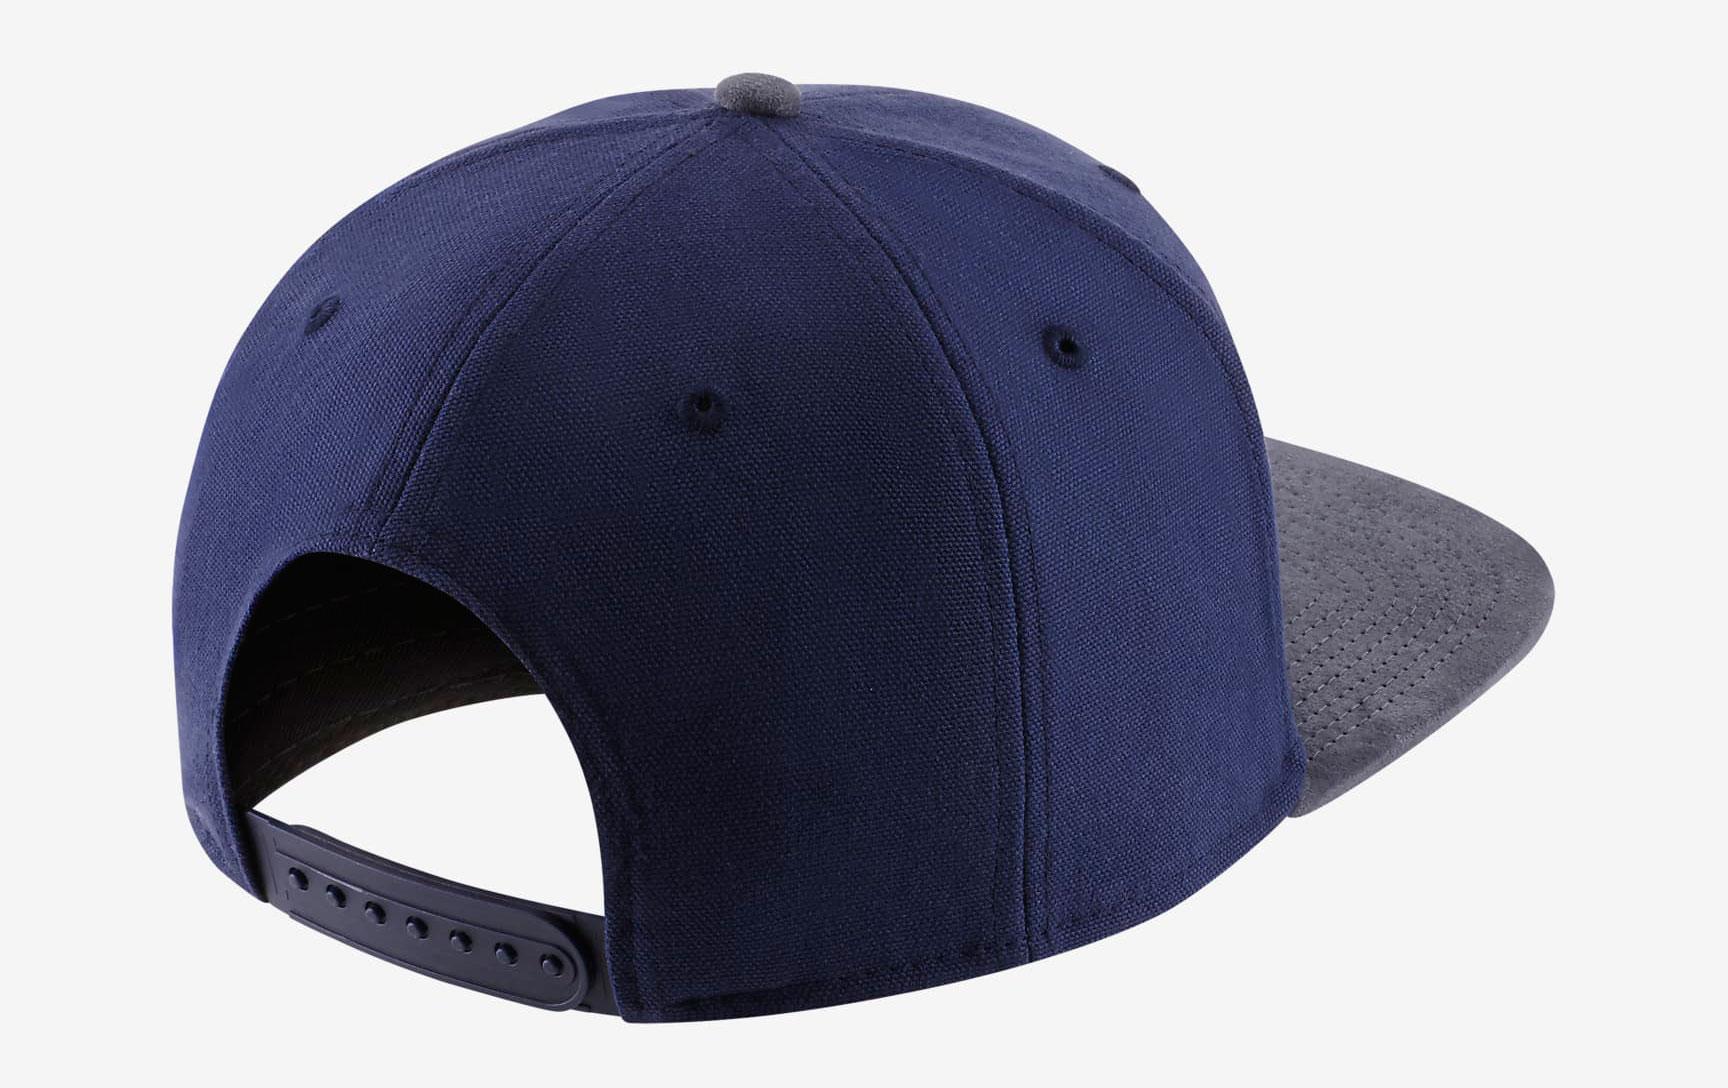 jordan-12-indigo-stone-blue-hat-match-2